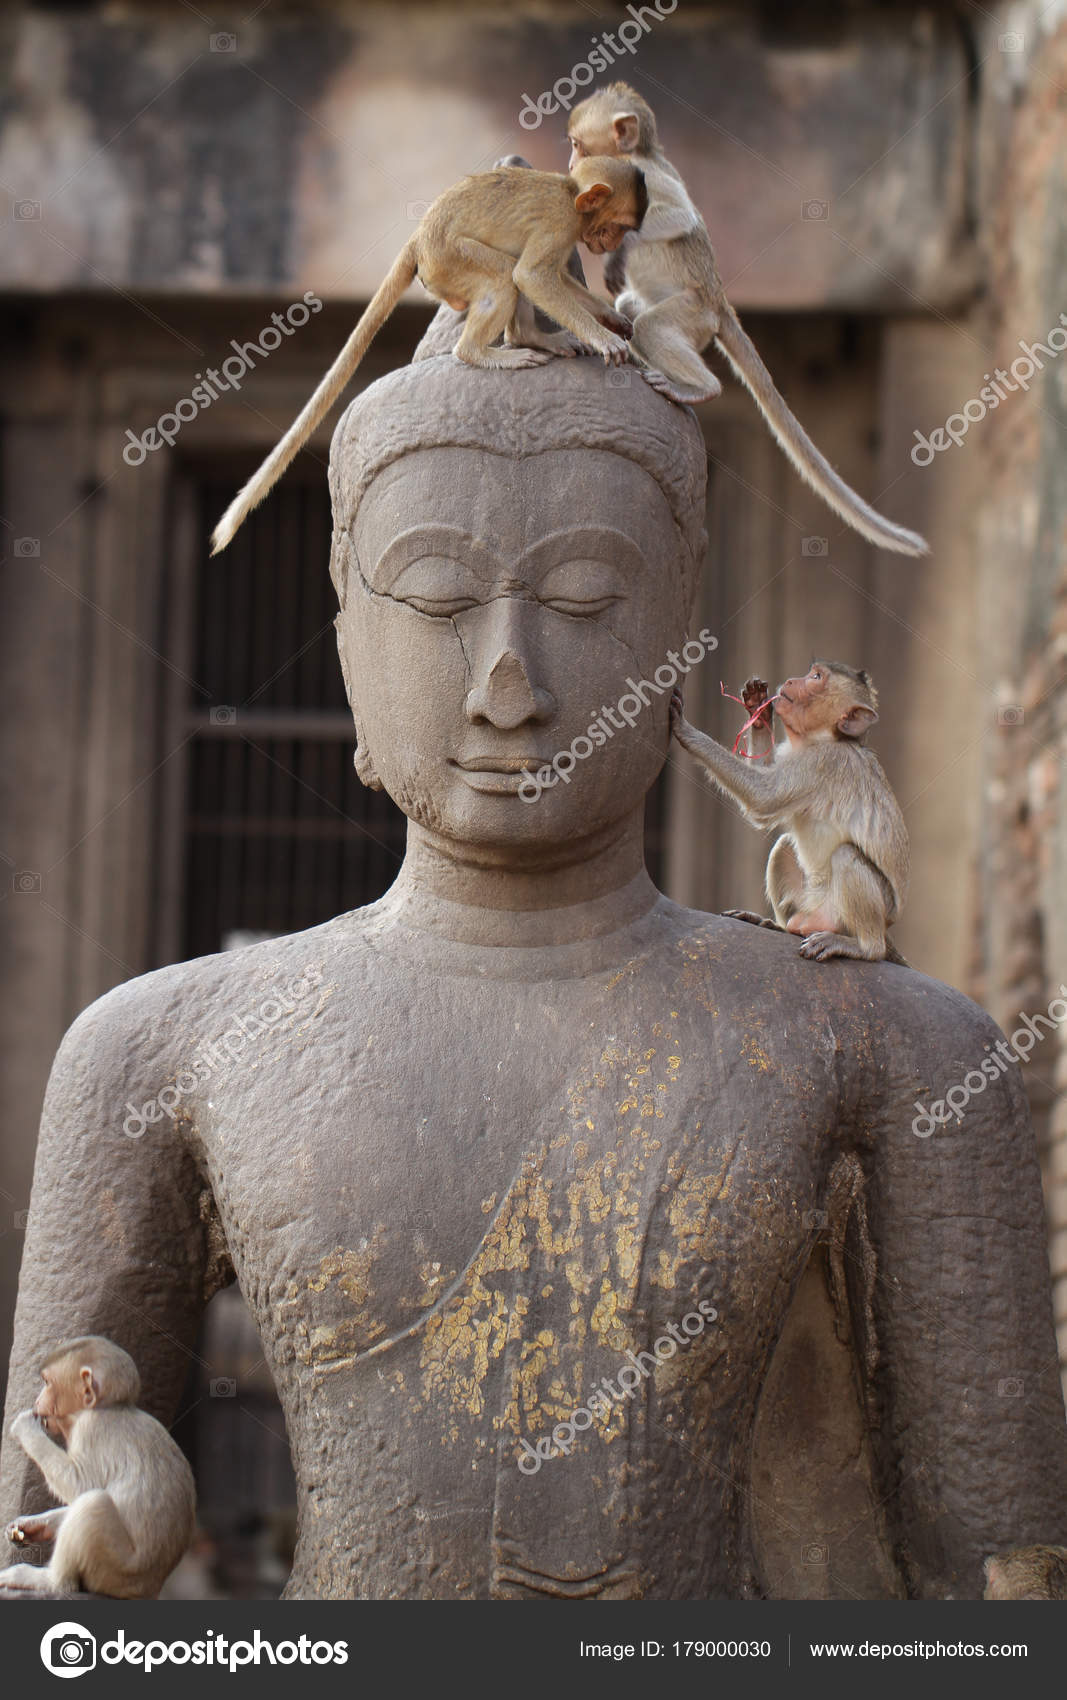 Pie Mono Los Ninos Jugando Antigua Estatua Principal Buda Cuadro